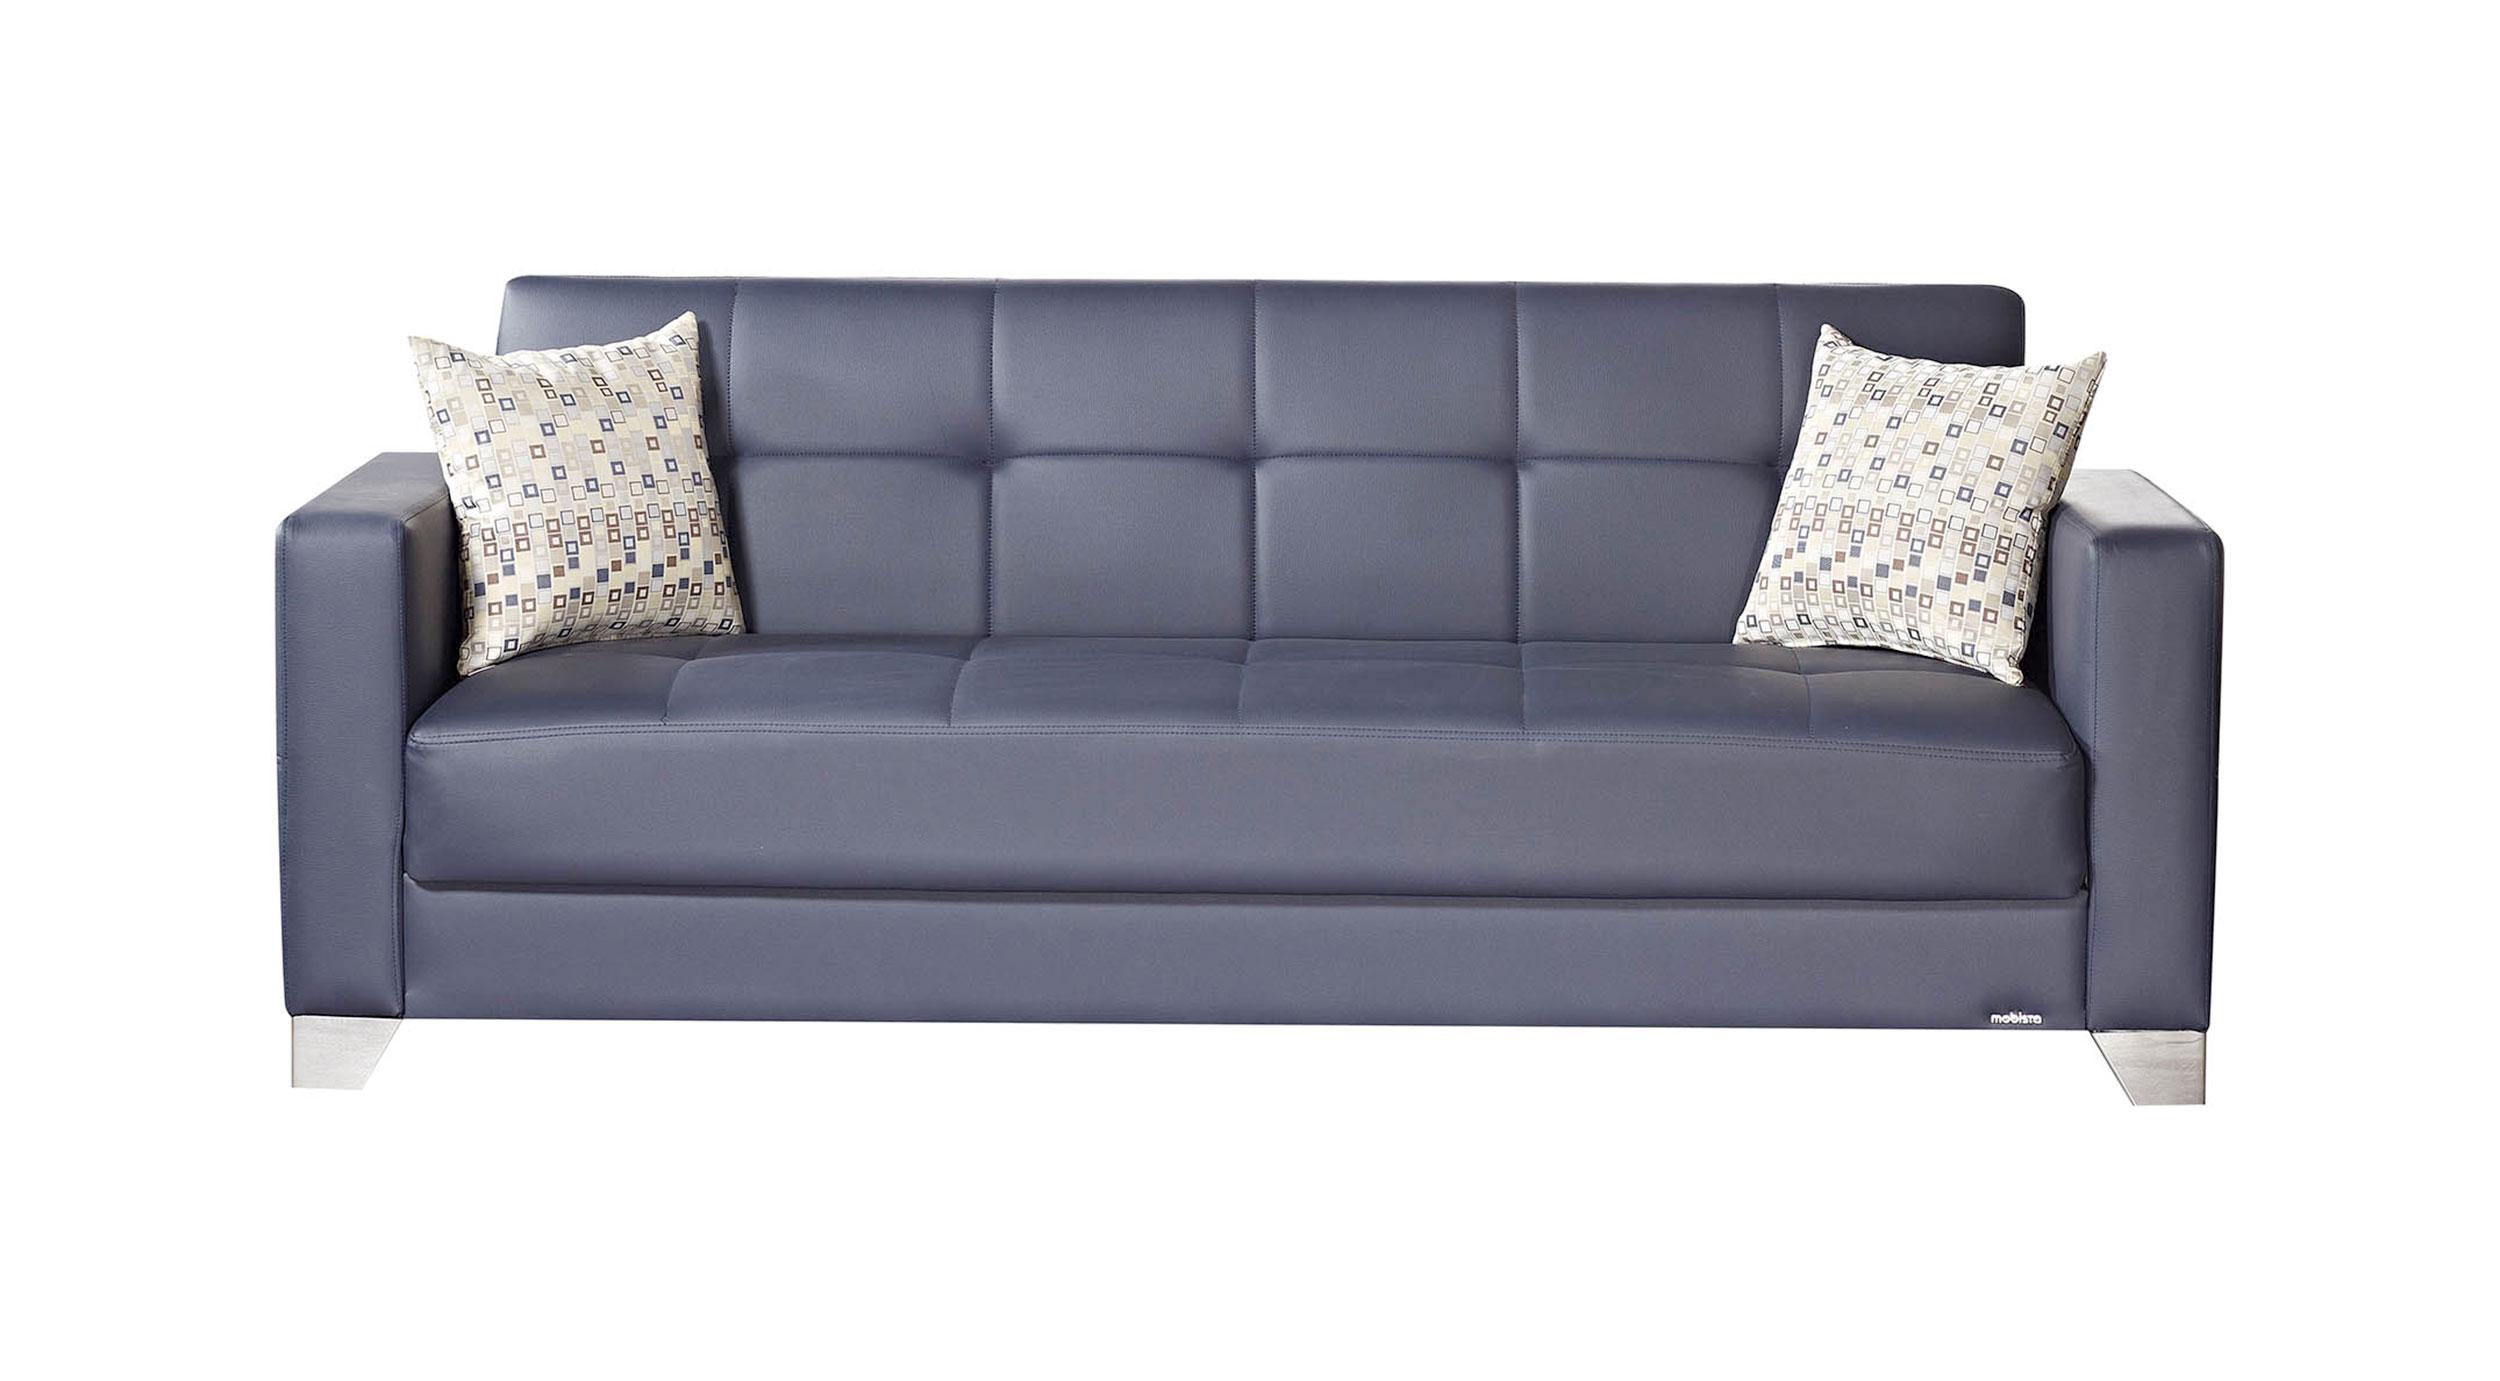 leatherette sofa durability design sets hyderabad telangana viva italia prestige navy blue bed by mobista